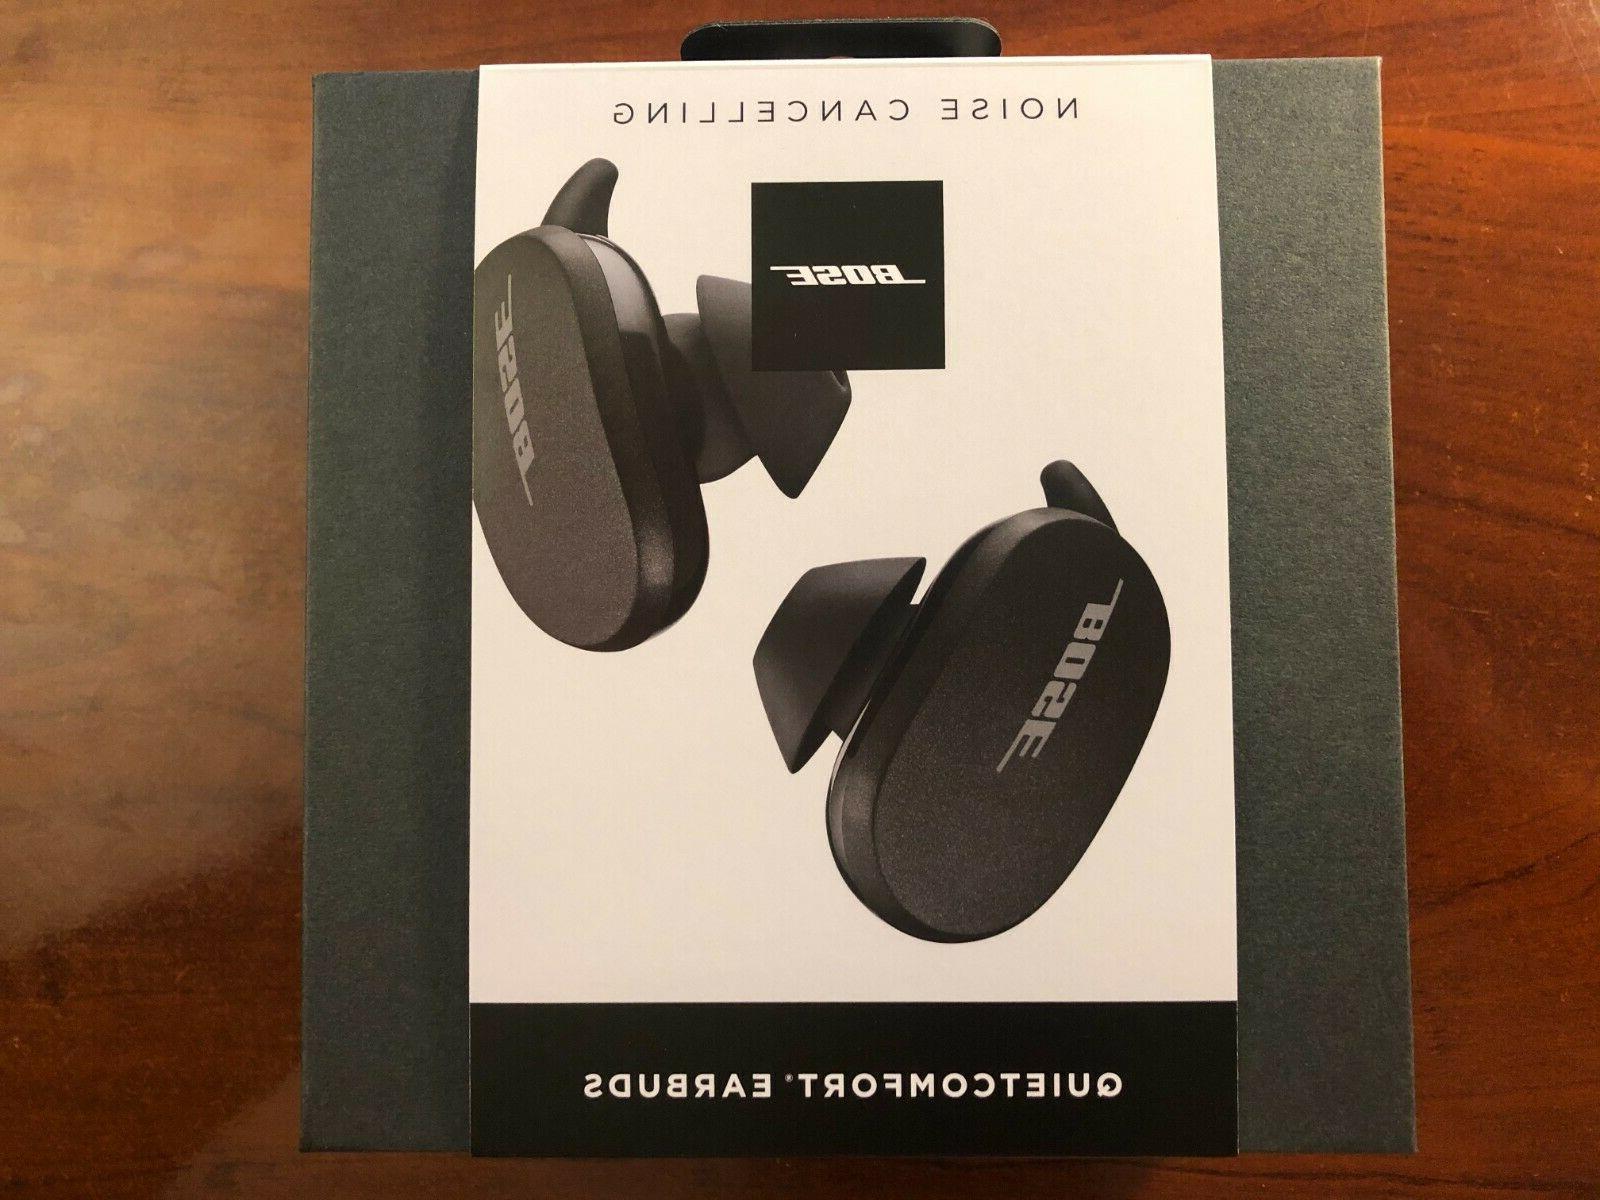 quietcomfort earbuds true wireless noise canceling earbuds